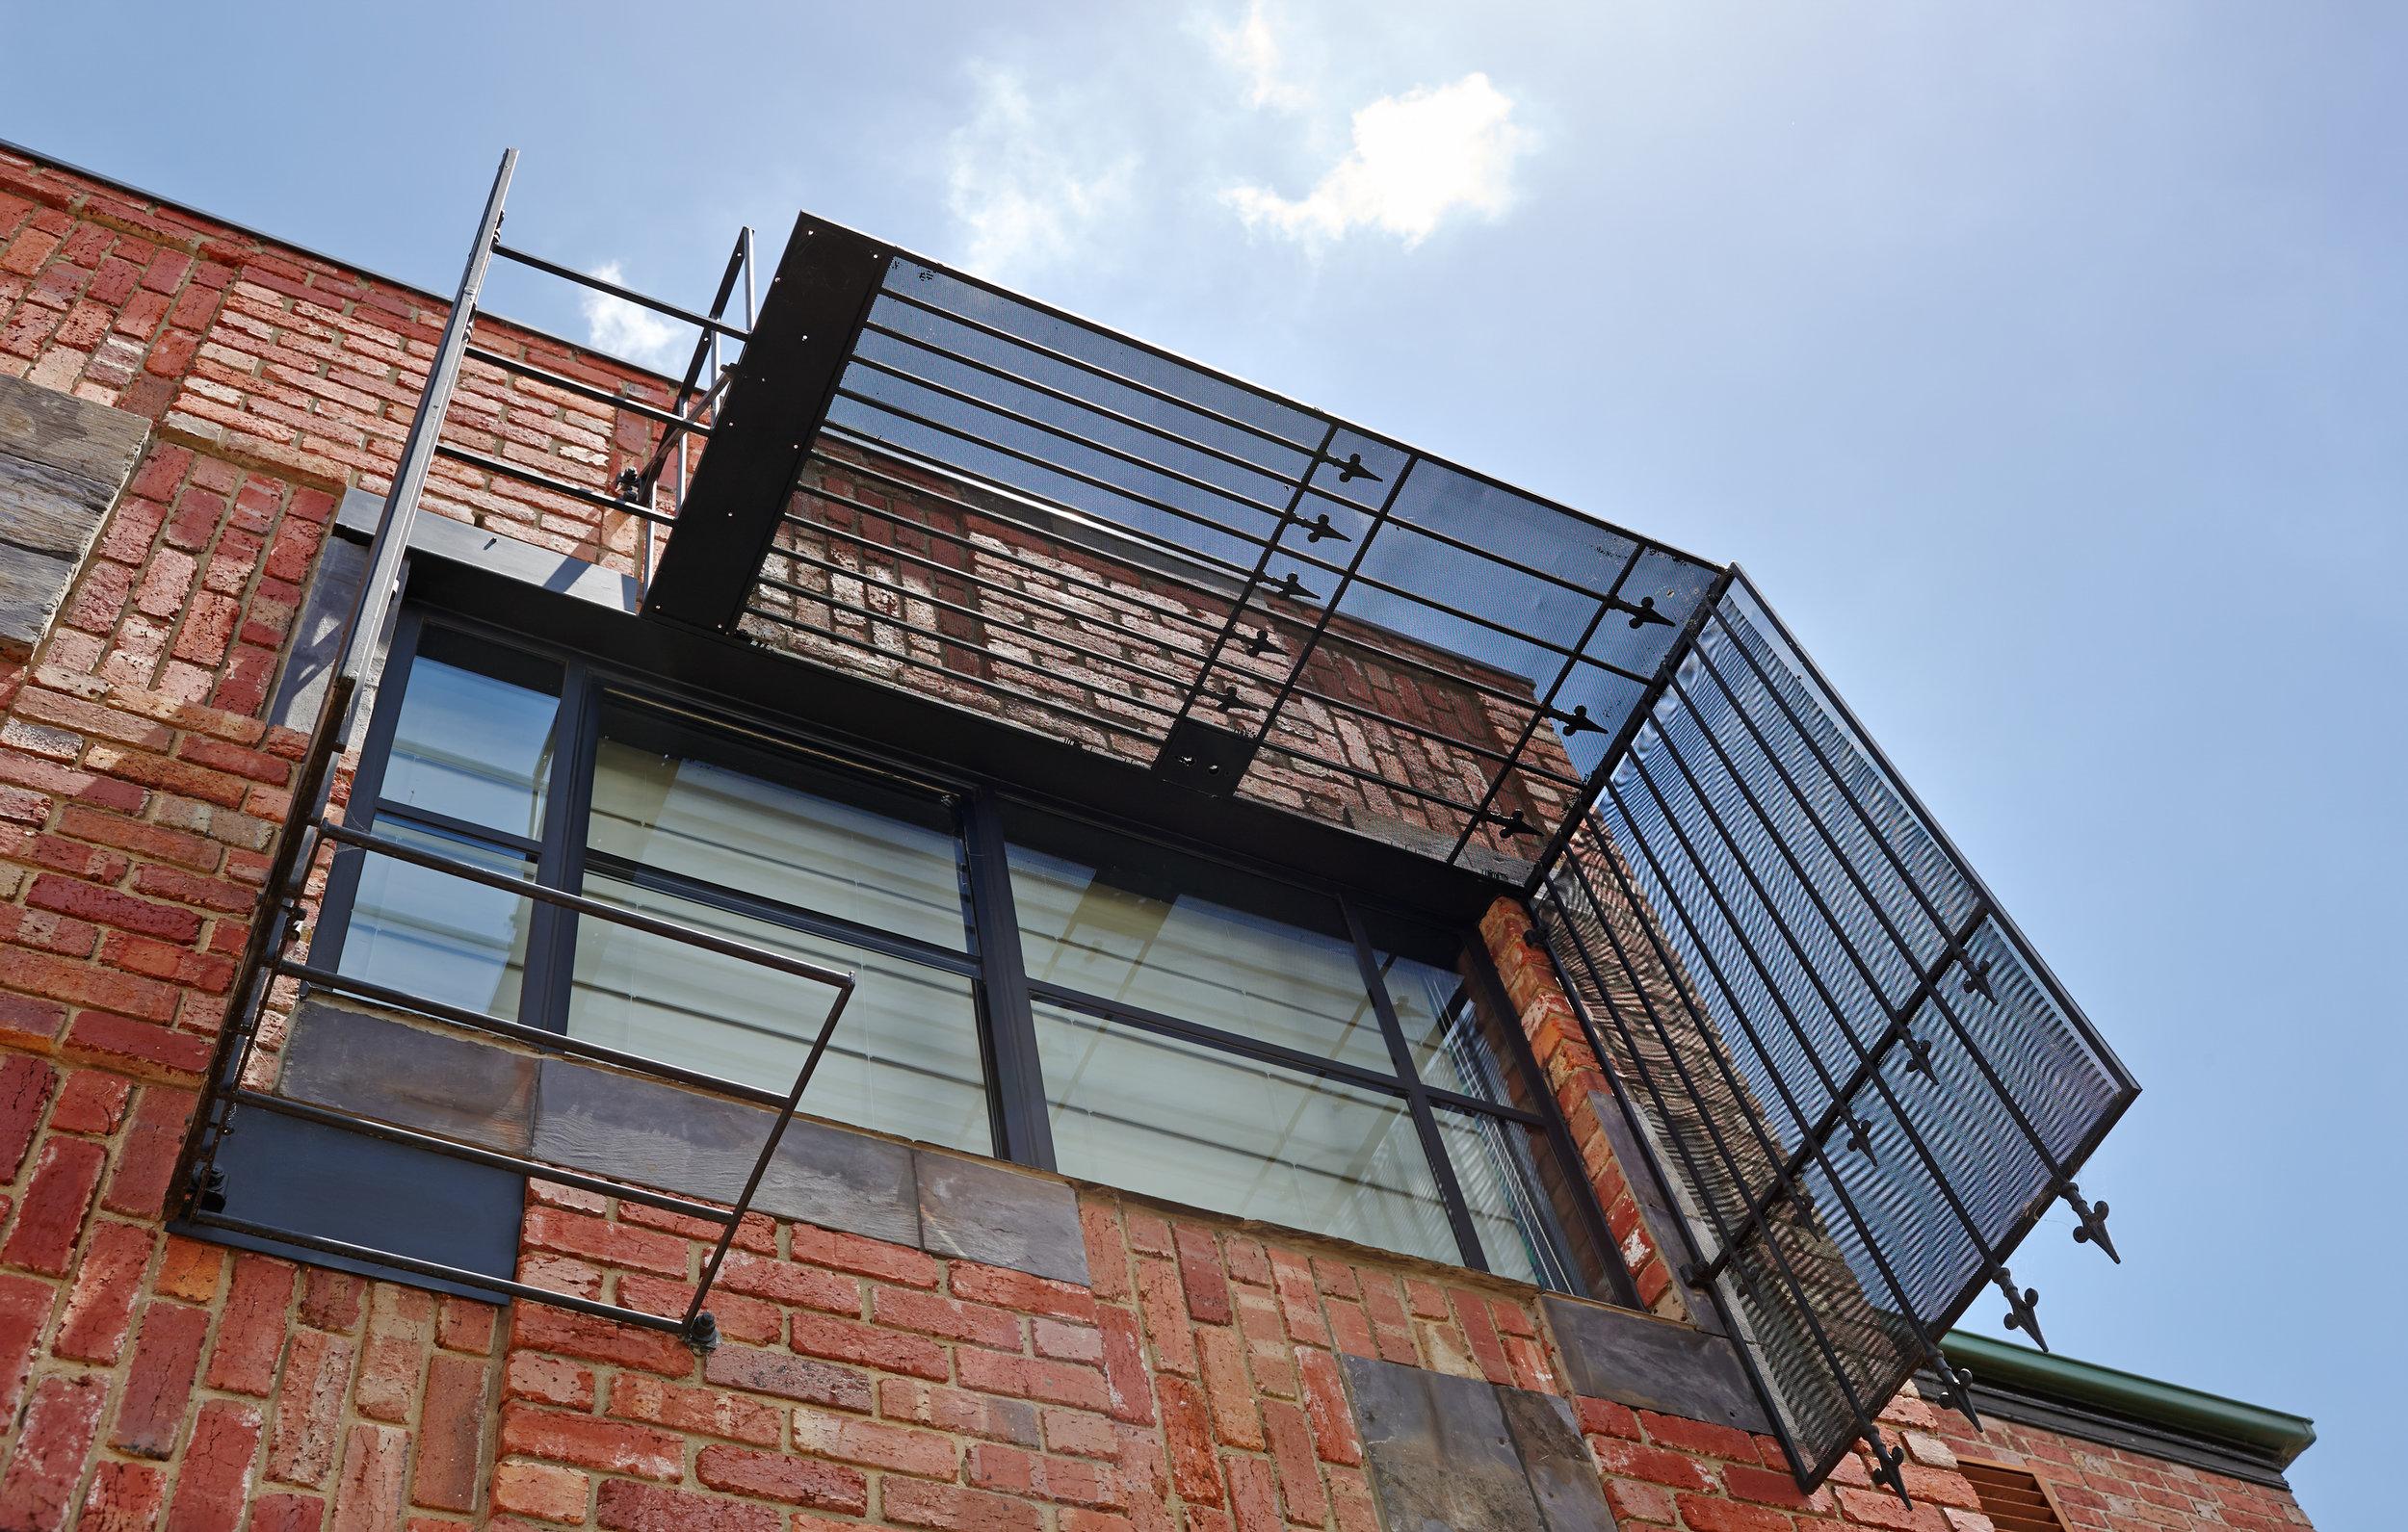 cubo-house-phooey-architects-the-design-emotive-09.jpg